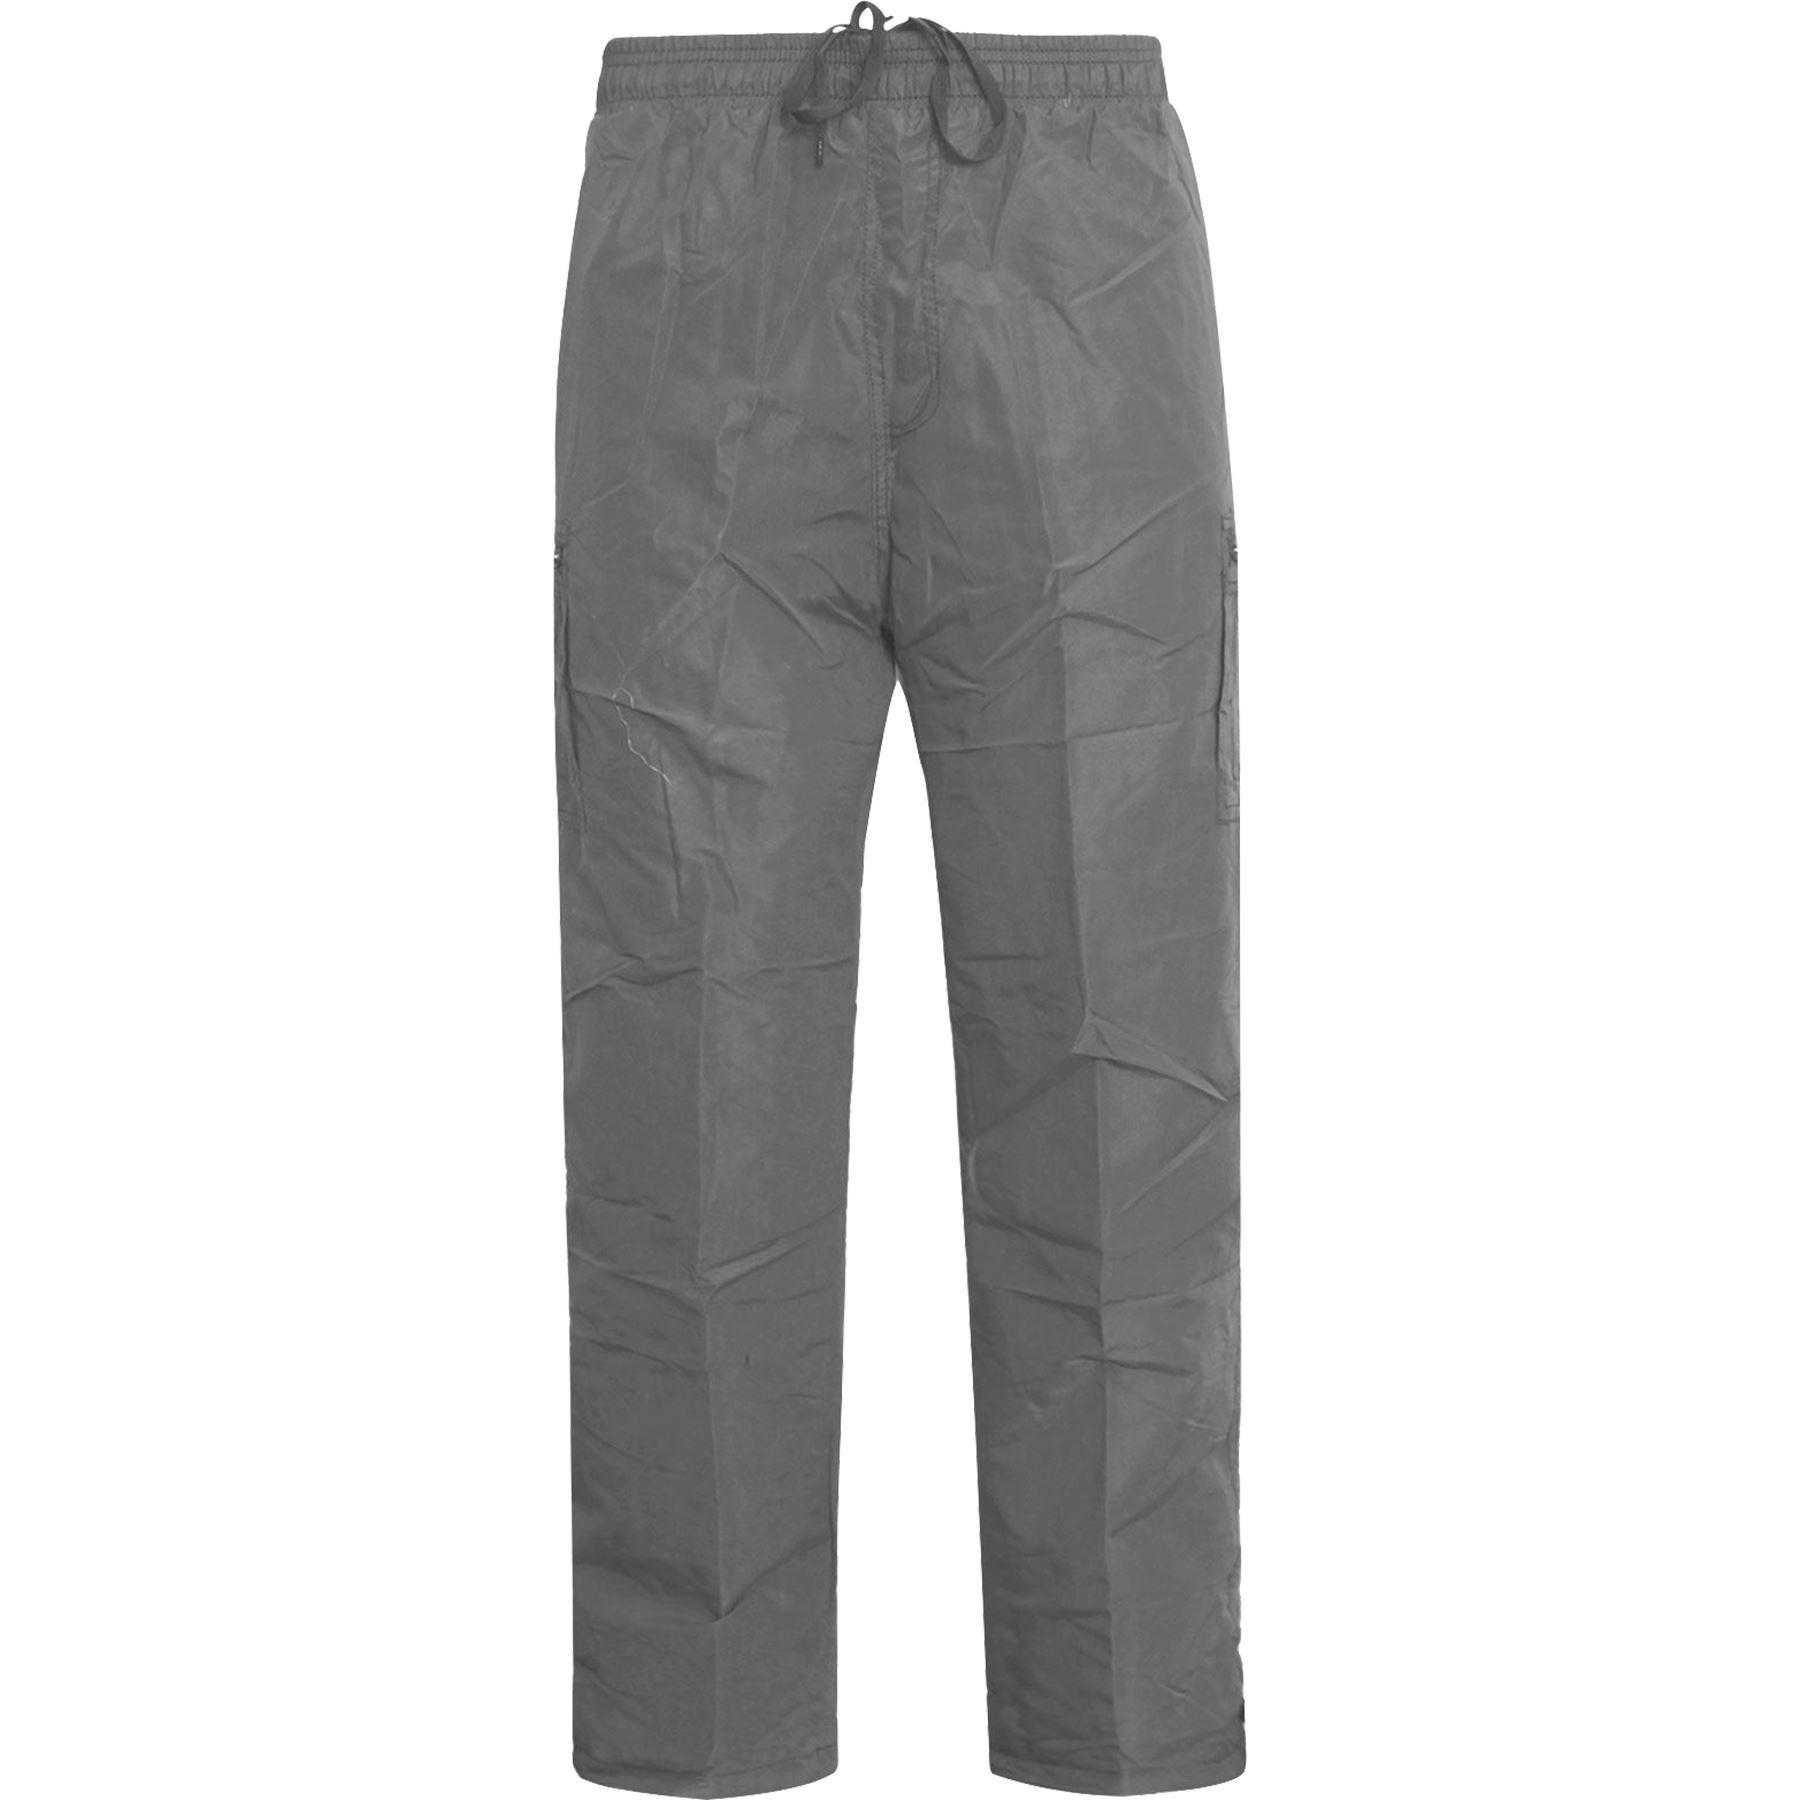 New-Mens-Lightweight-Elasticated-Cargo-Trousers-Combat-Work-Pants-Bottoms-M-XXL thumbnail 4